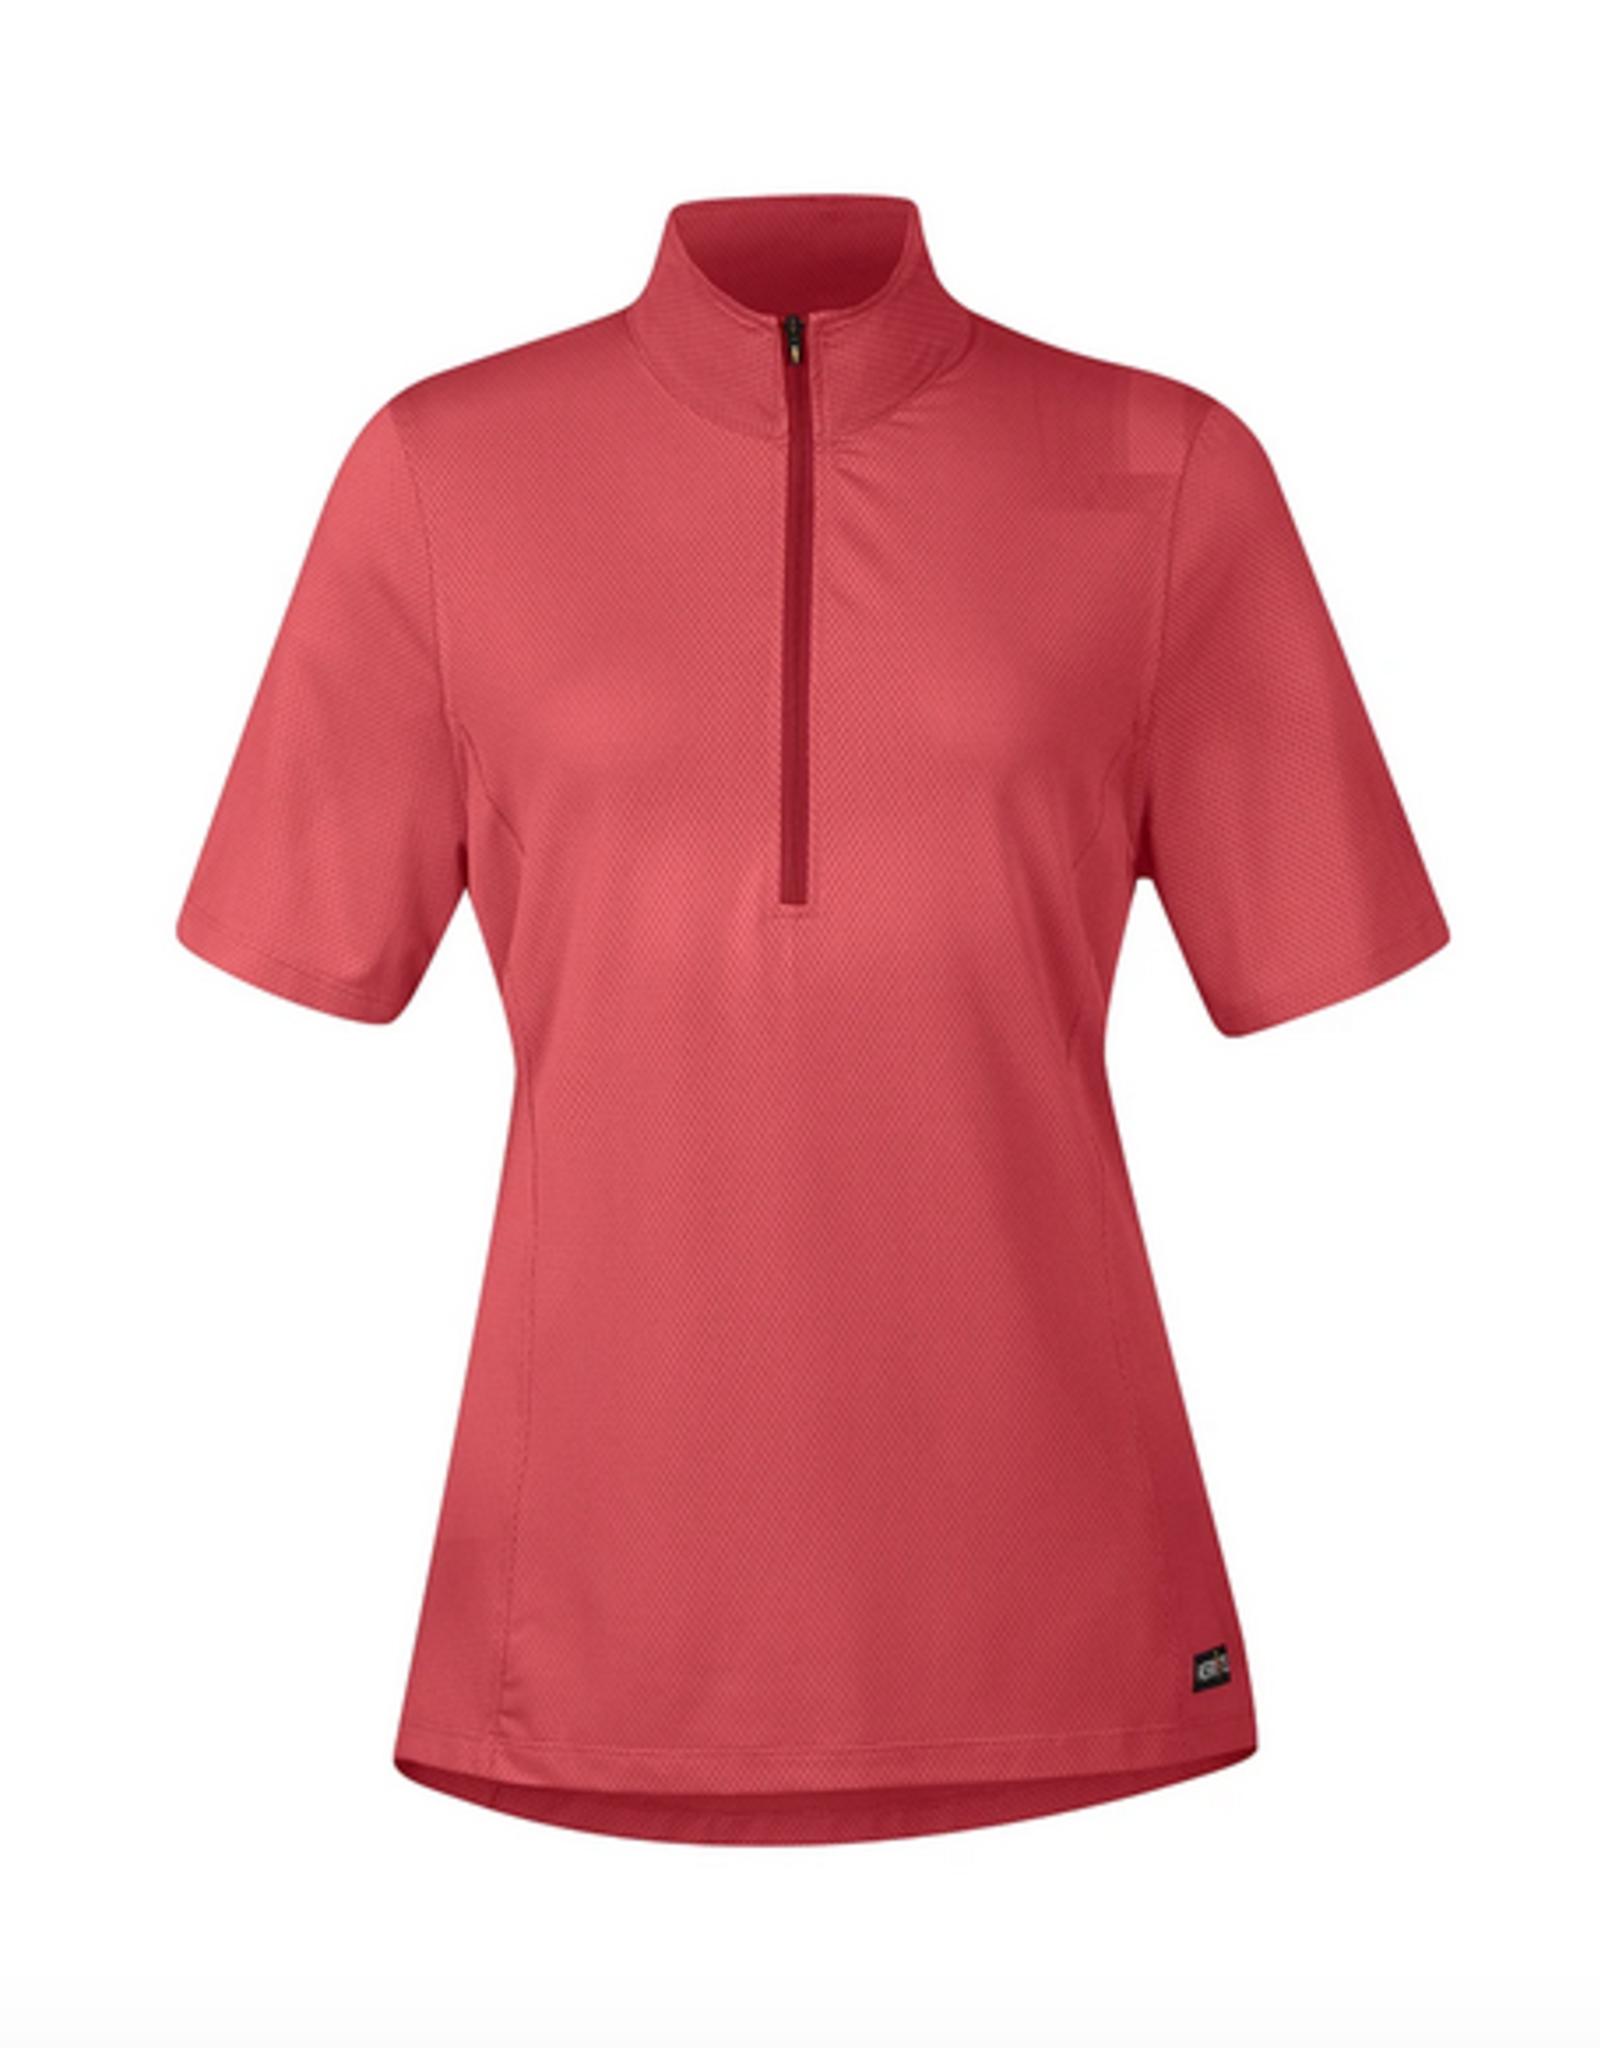 Kerrits Ladies' Ice Fil Lite Short Sleeve Shirt